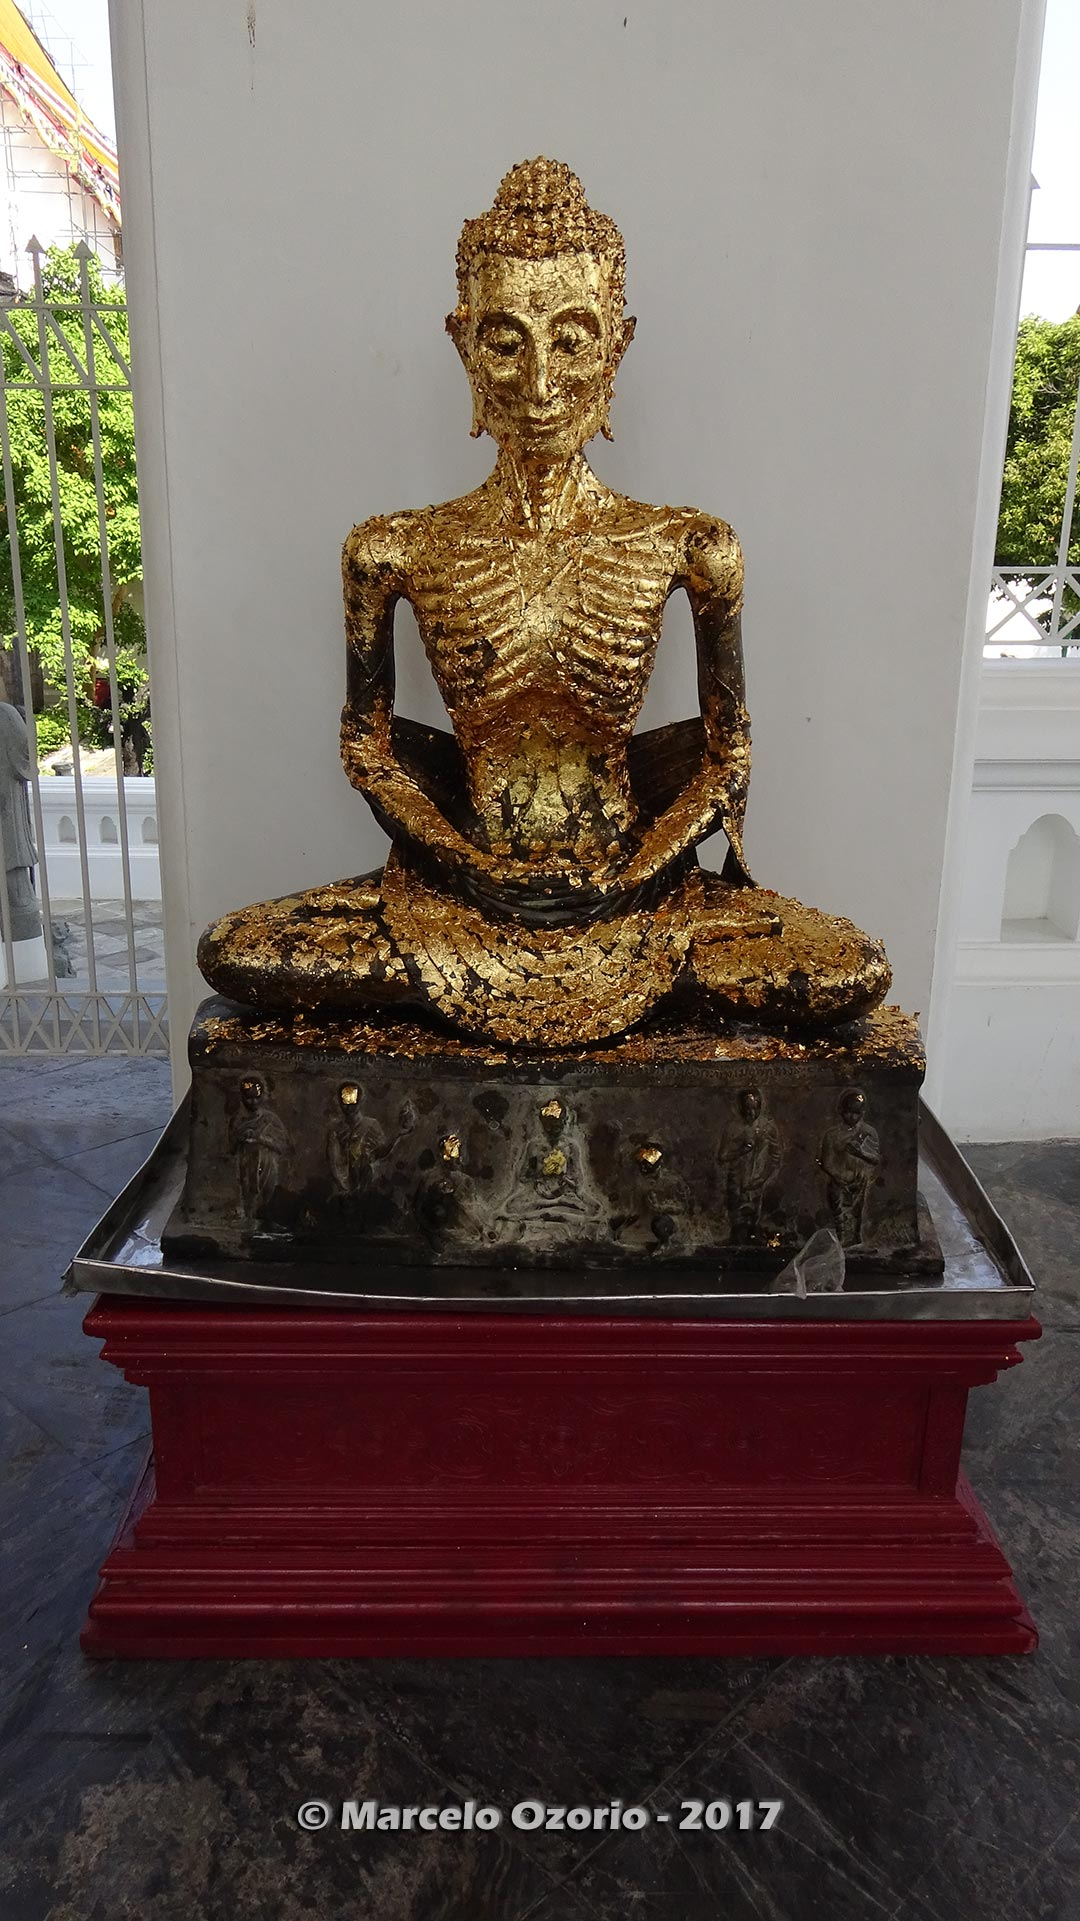 budhas bangkok thailand serie 16 - Buddhas of Bangkok - Thailand